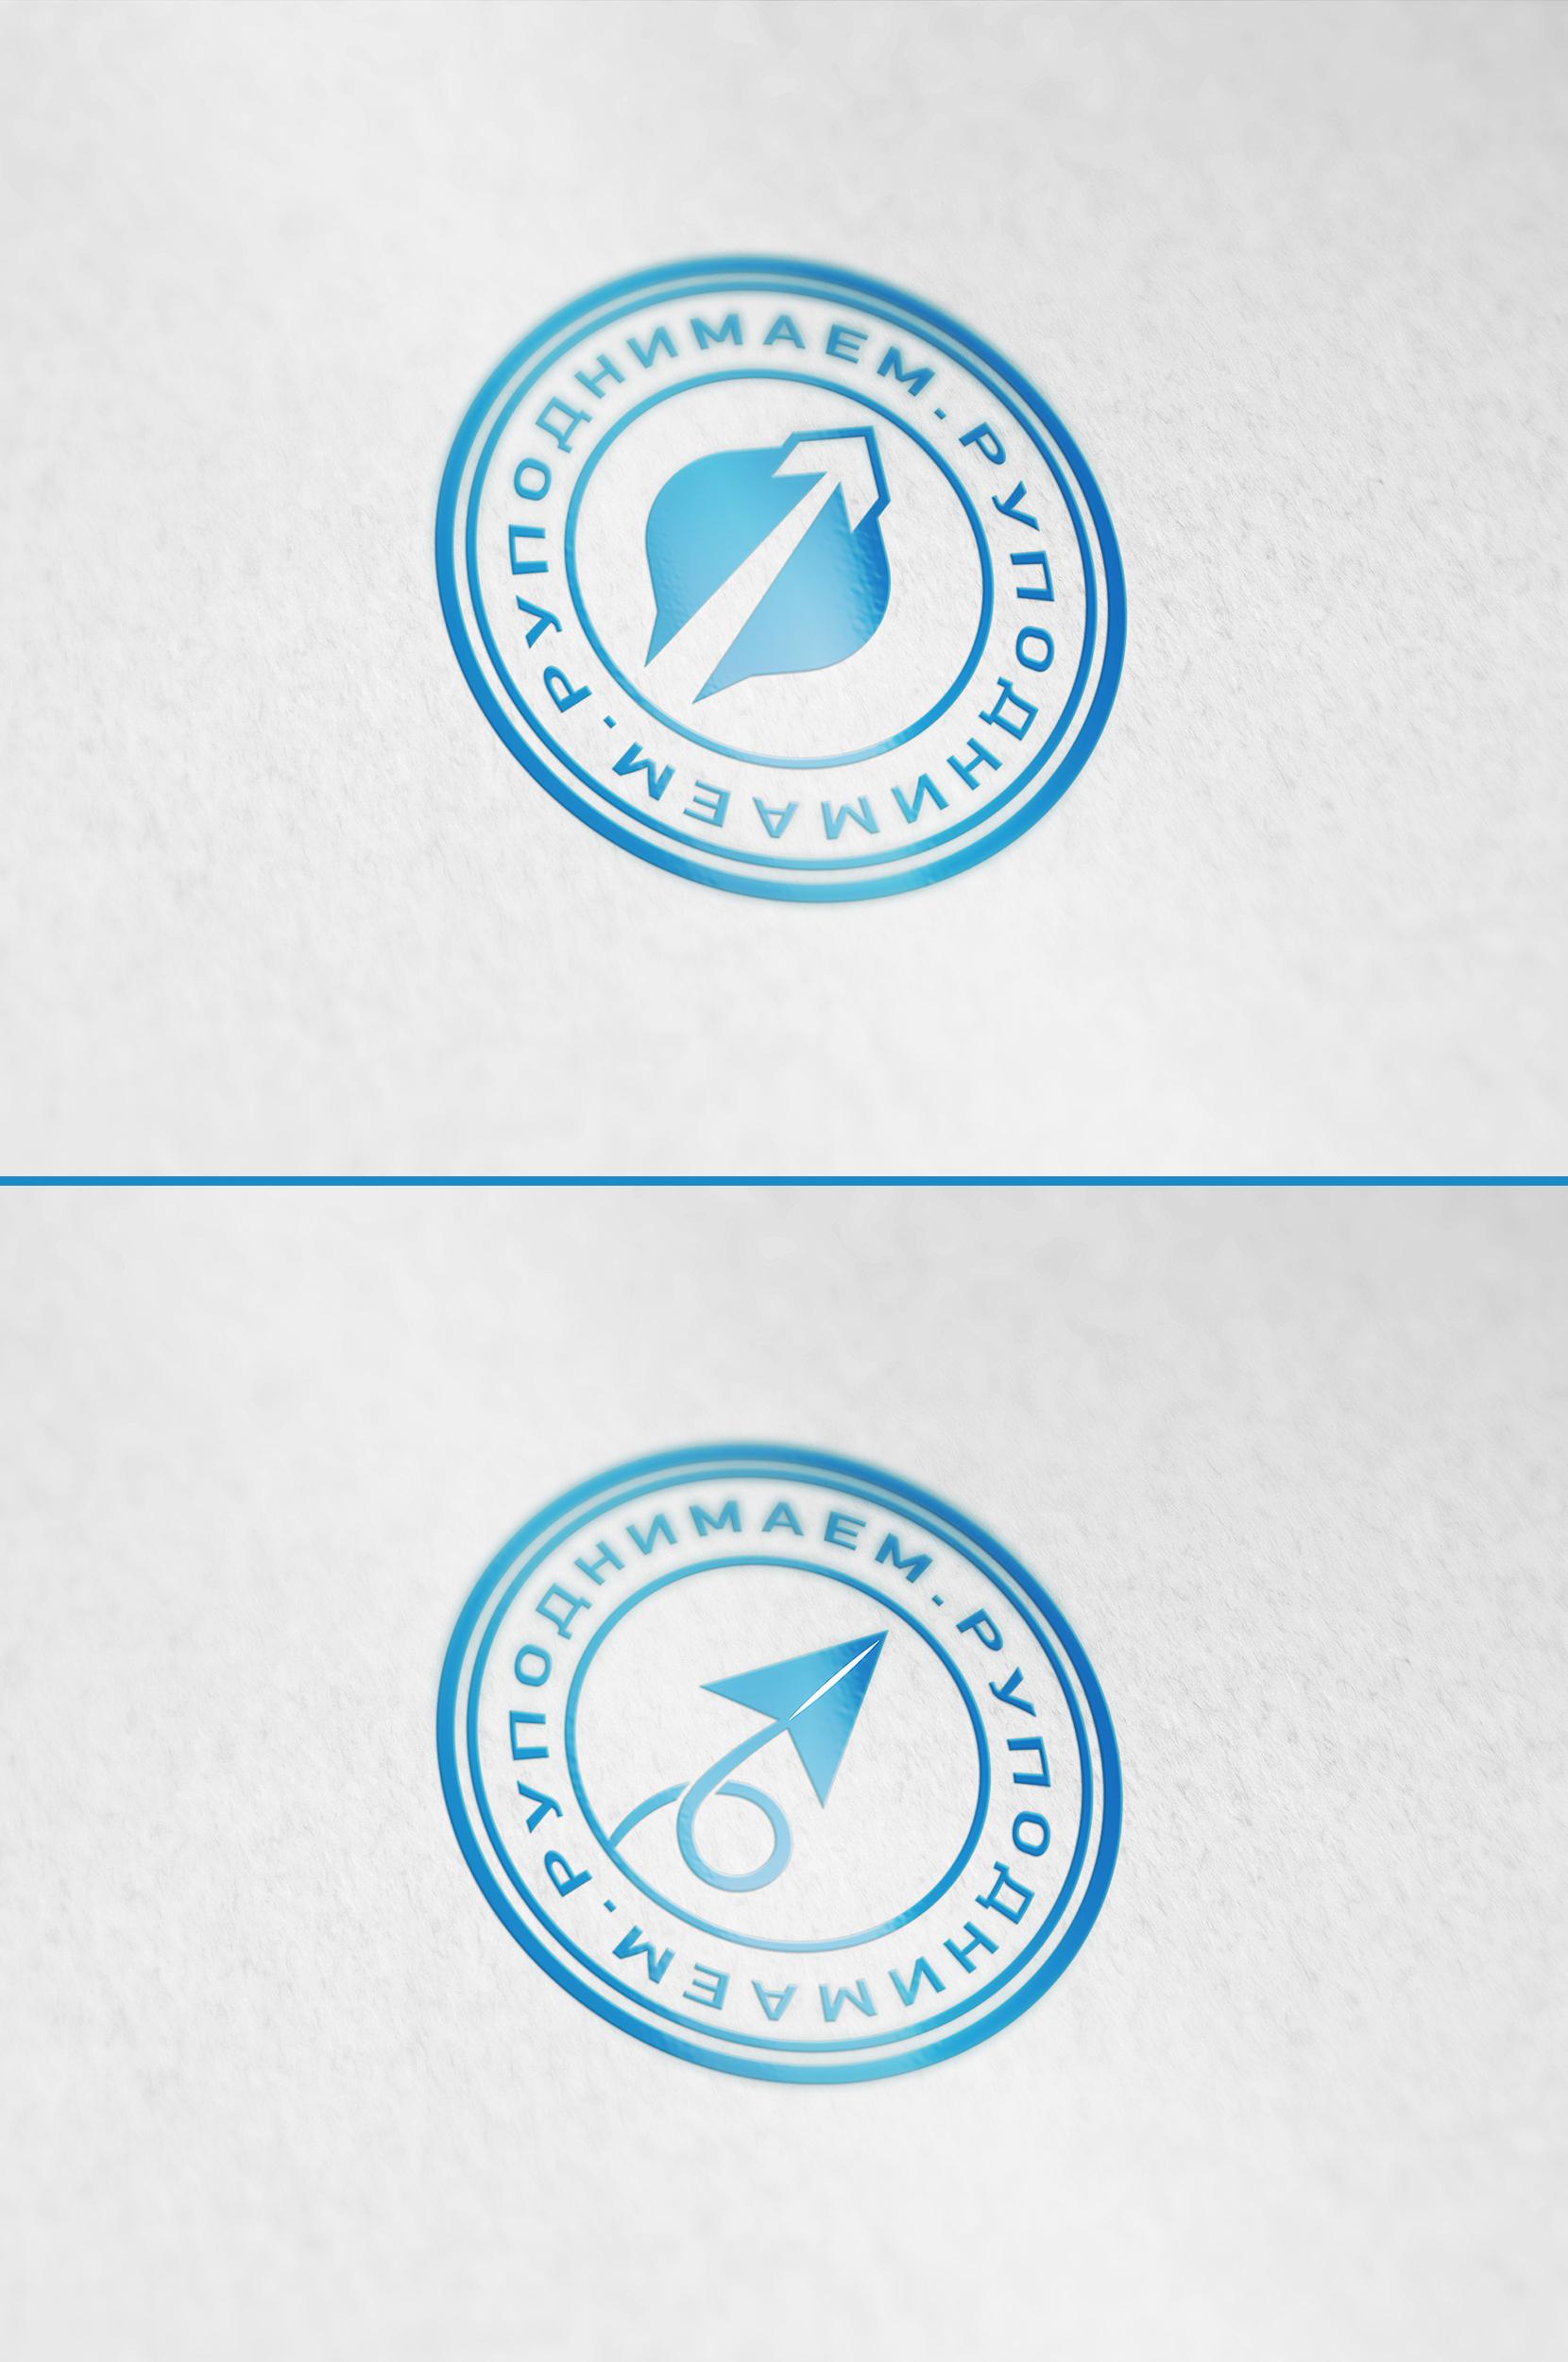 Разработать логотип + визитку + логотип для печати ООО +++ фото f_1165551eebfe8f47.jpg